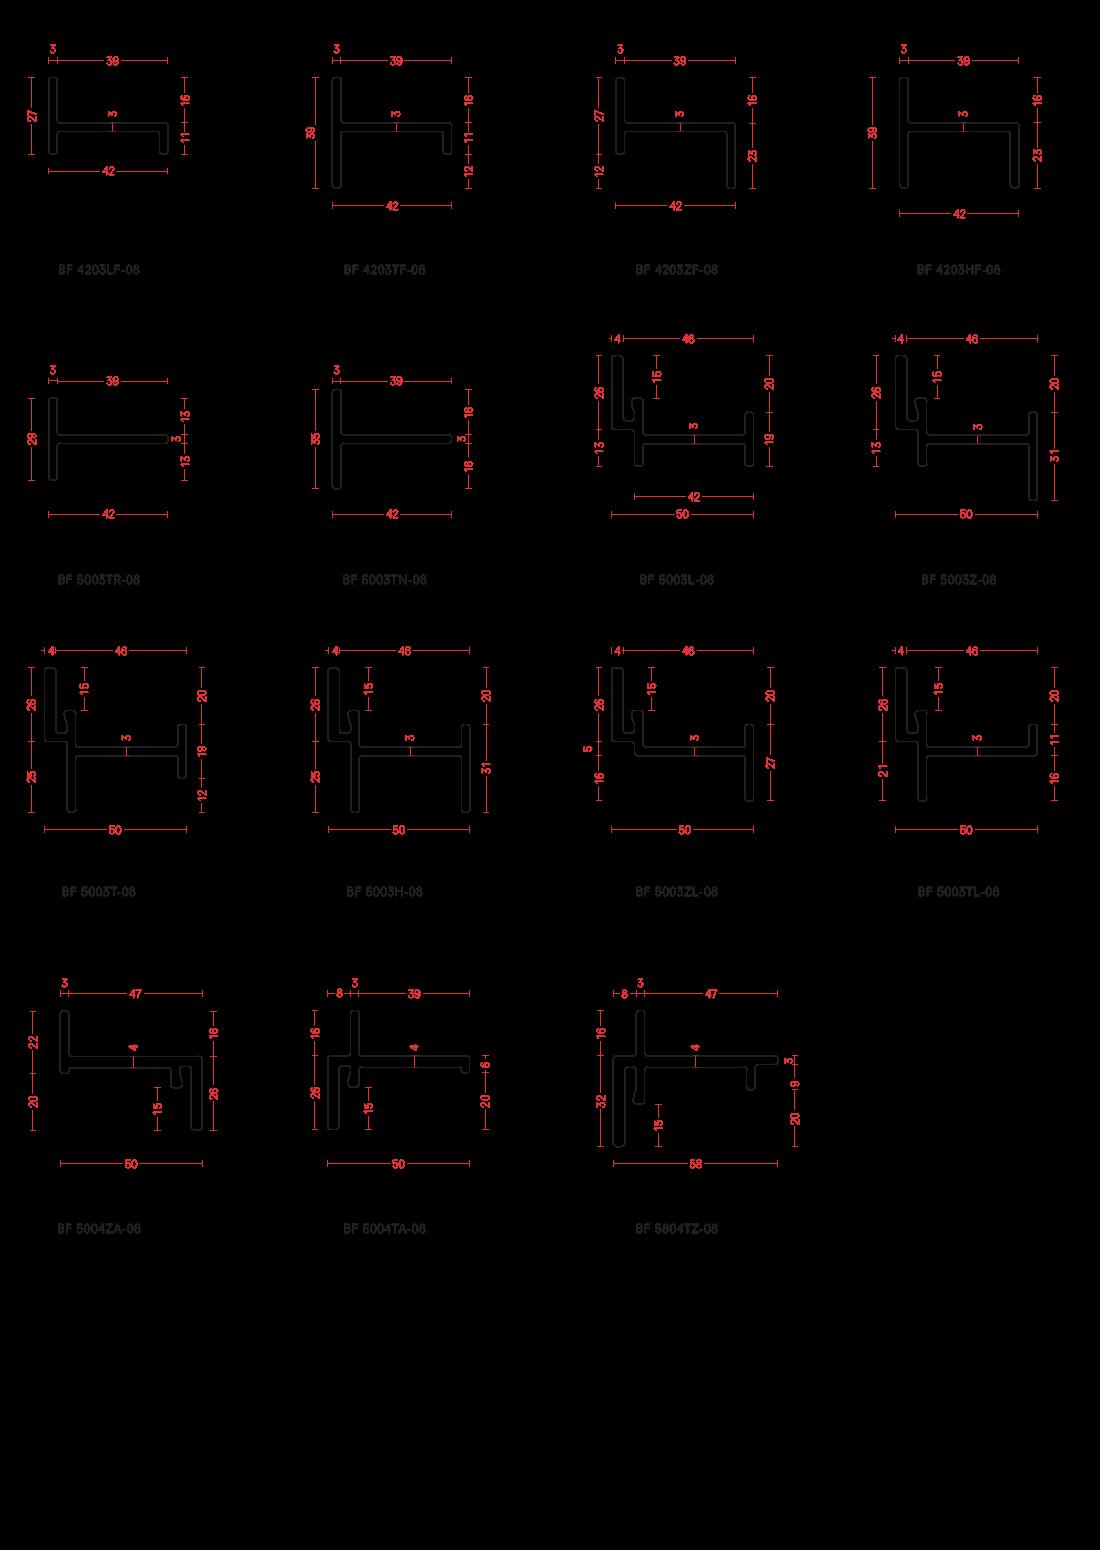 B40_Profile-Range